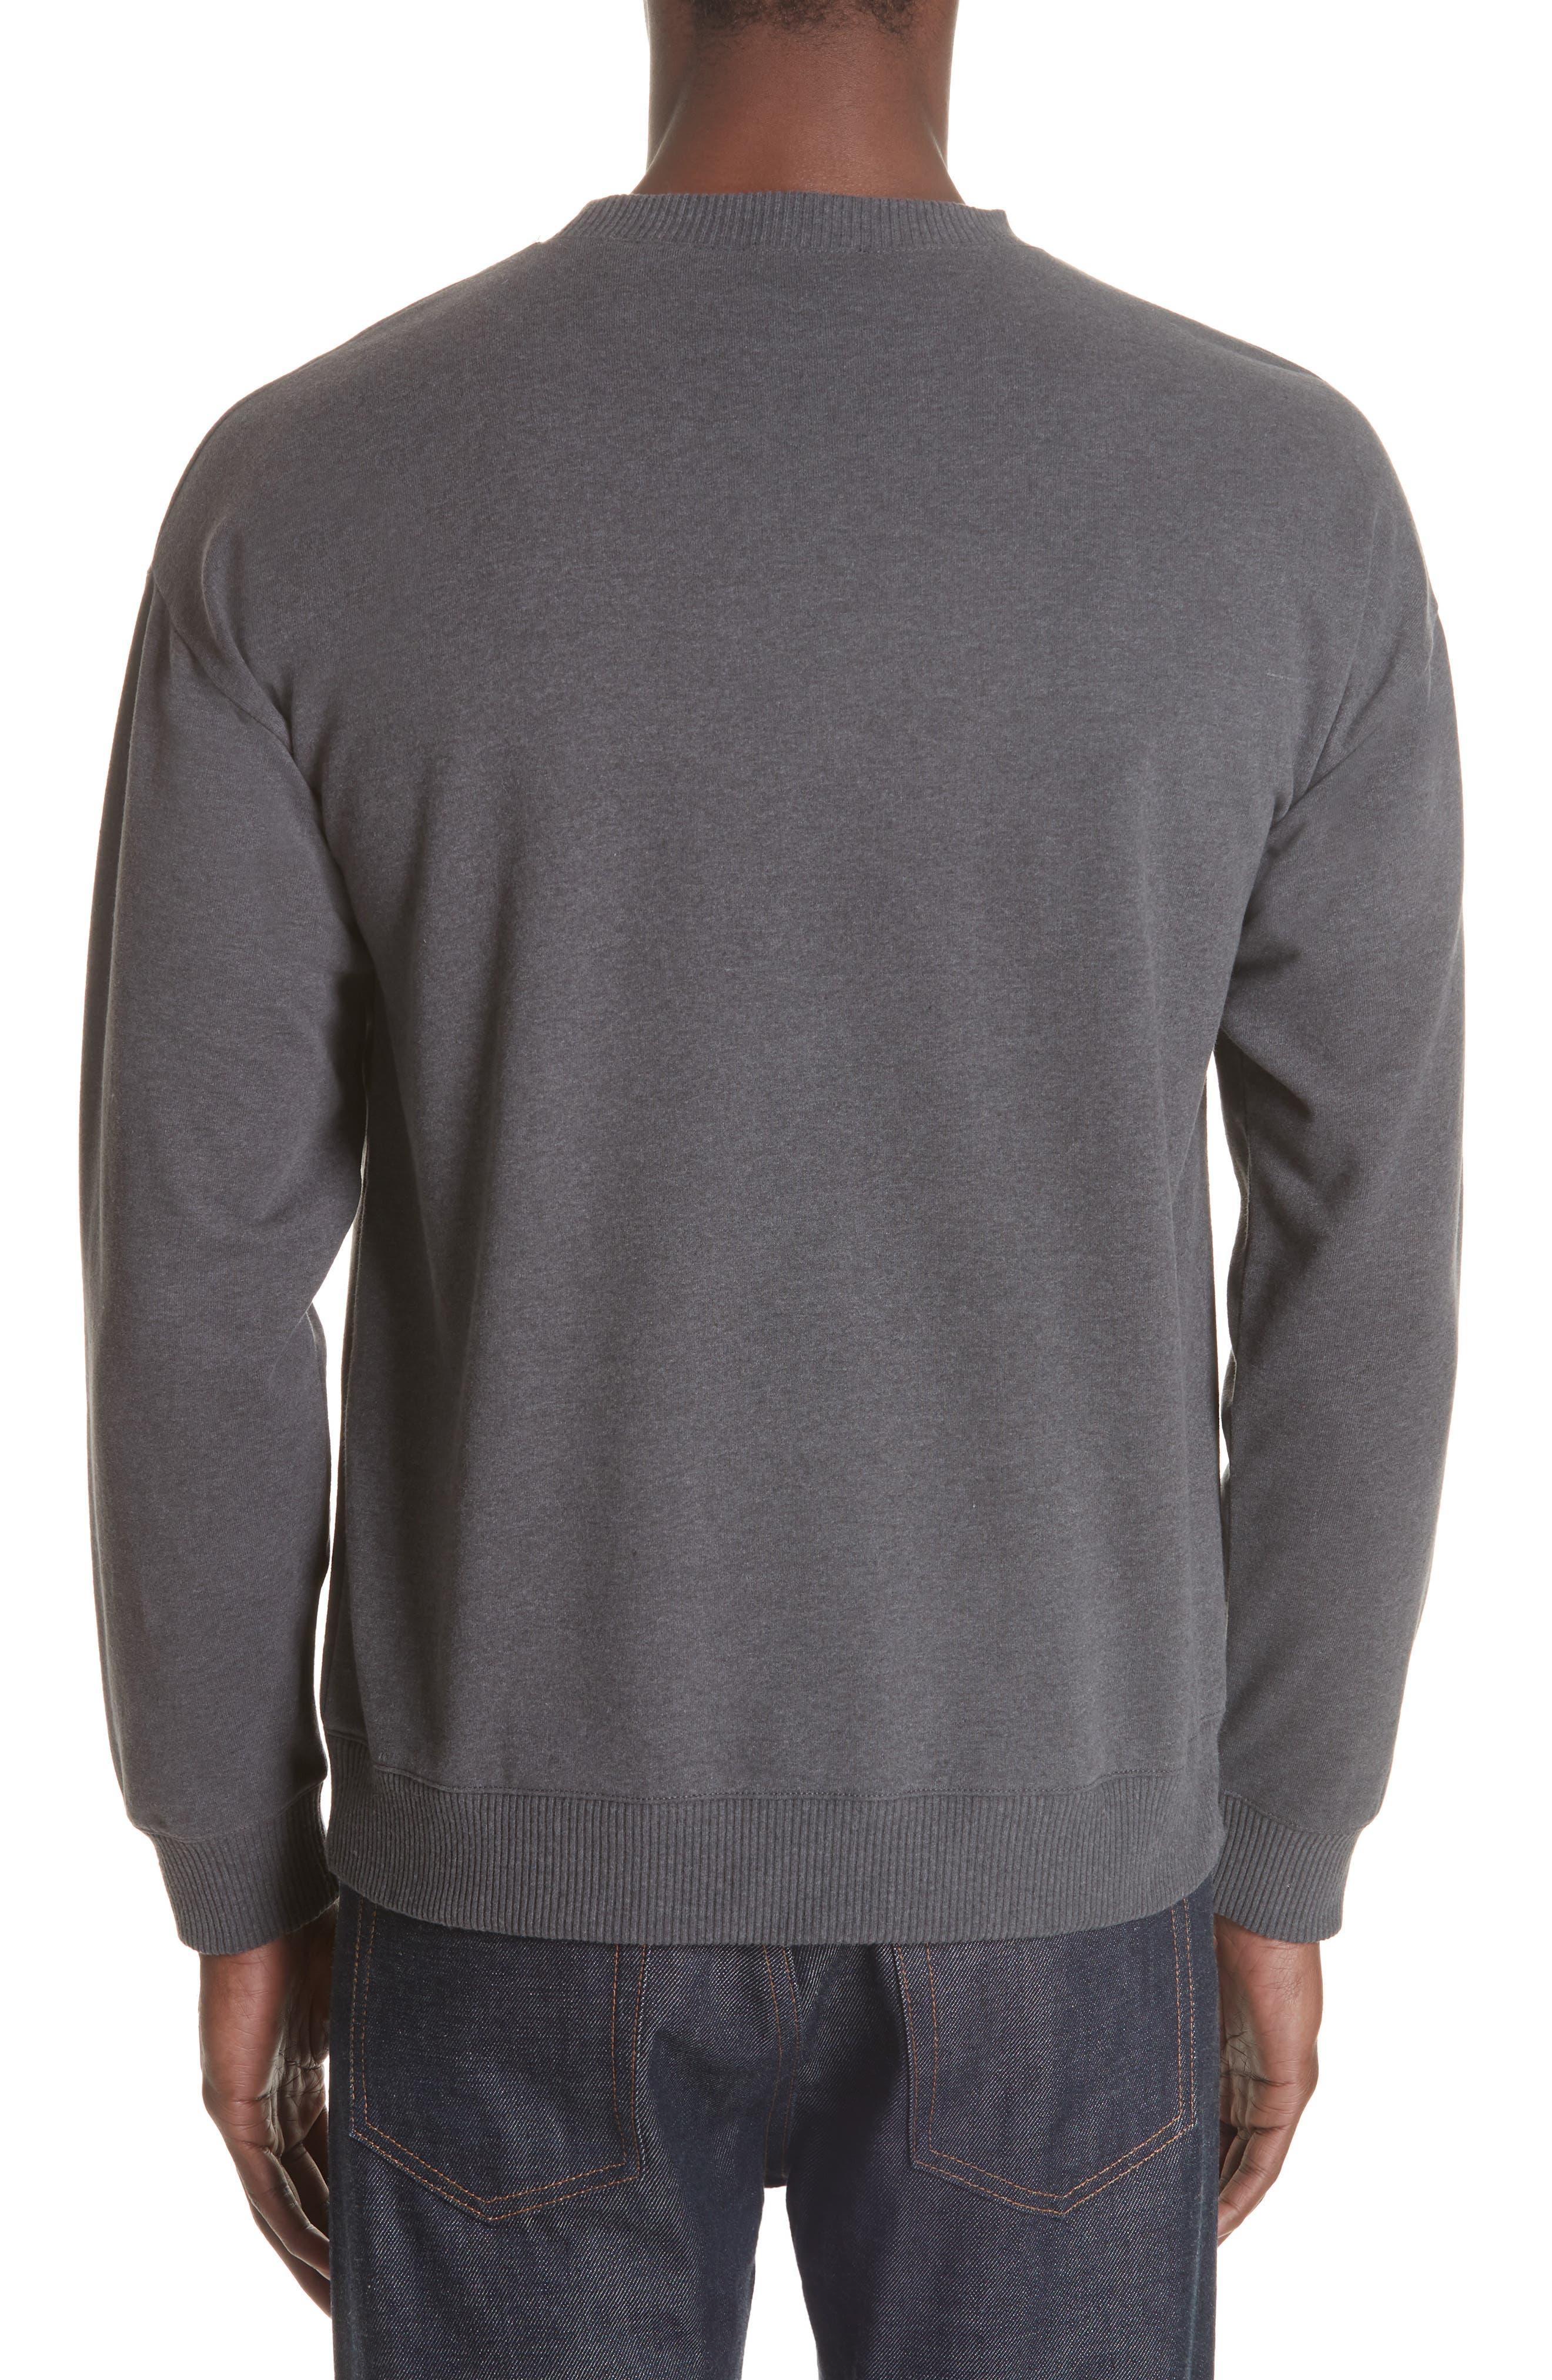 Roman Crewneck Sweatshirt,                             Alternate thumbnail 2, color,                             ANTHRACITE LAD